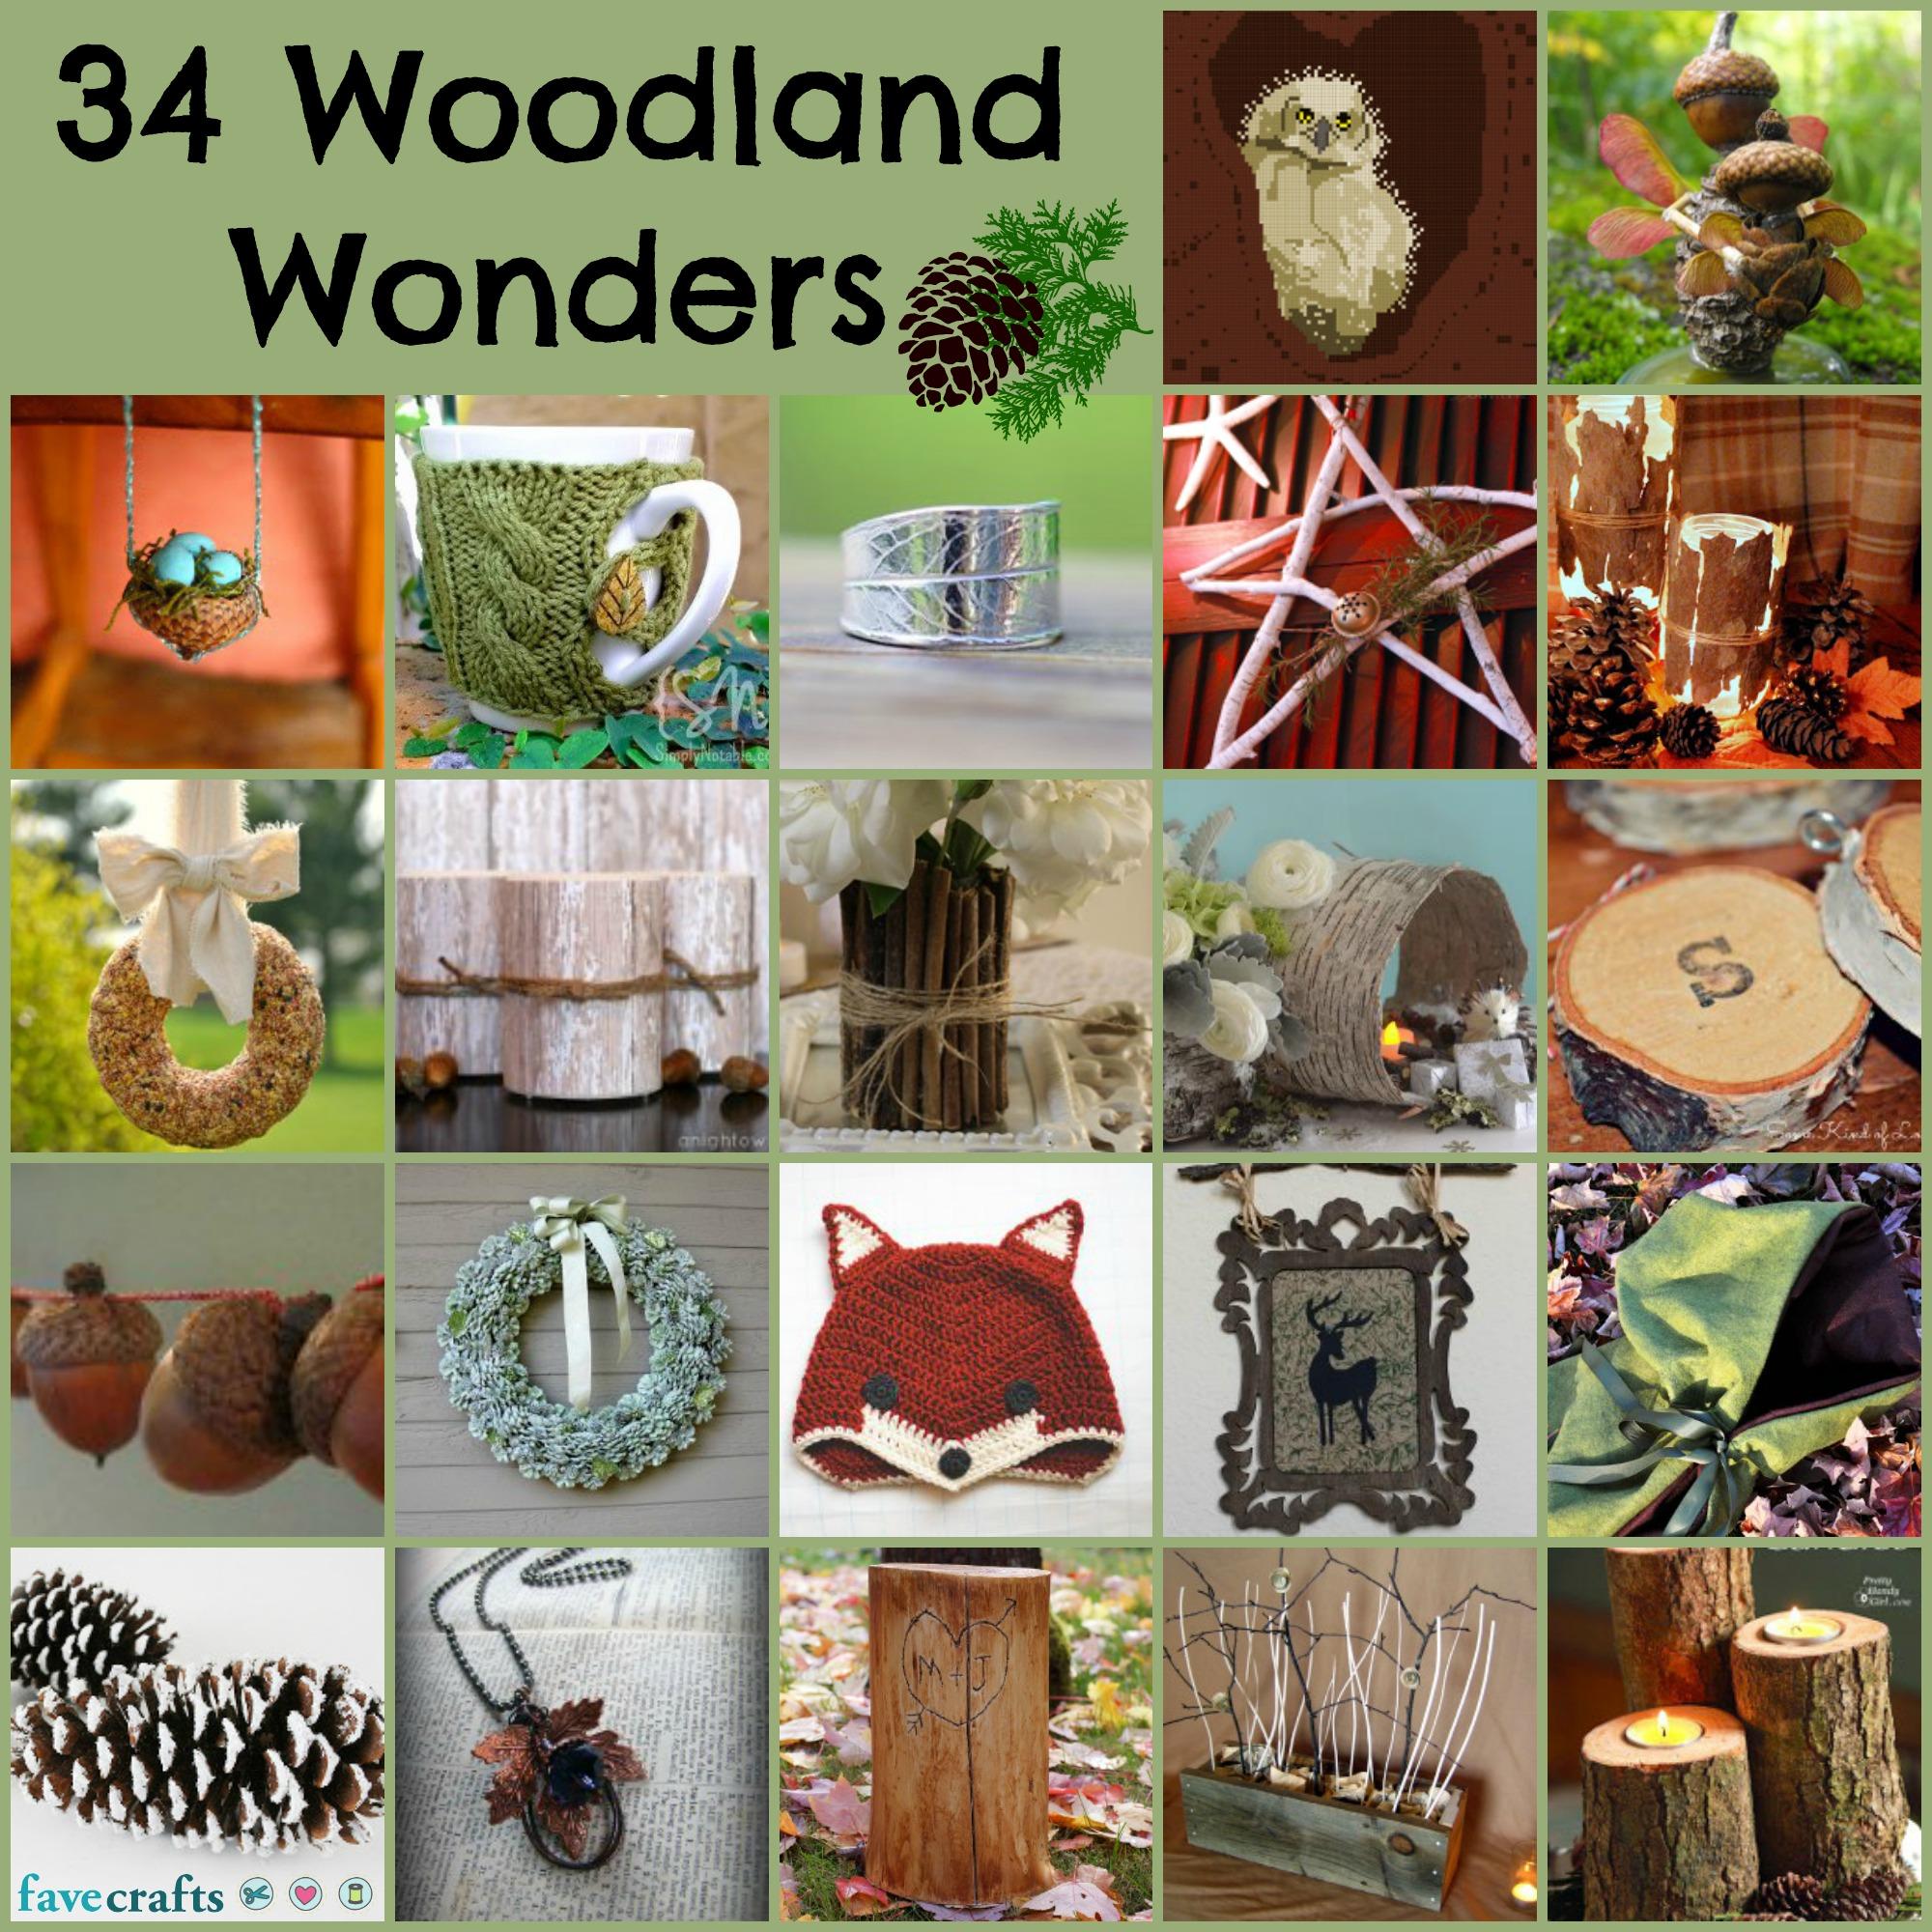 woodland wonders 34 Woodland Wonders